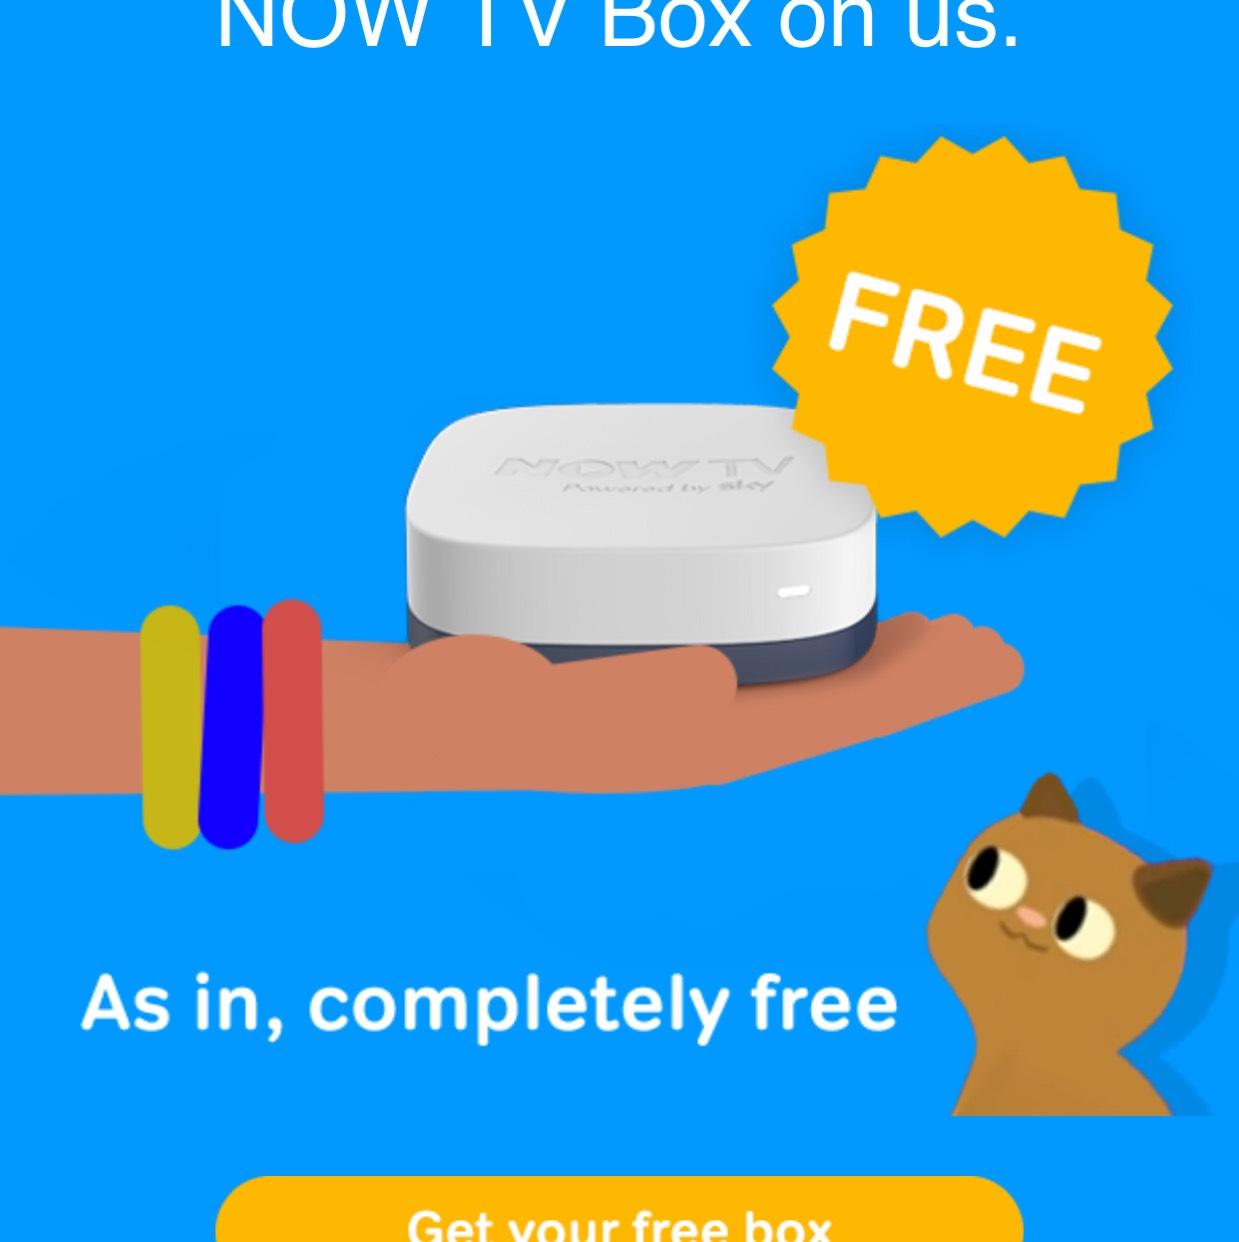 Free Now TV box - Worth £14.99